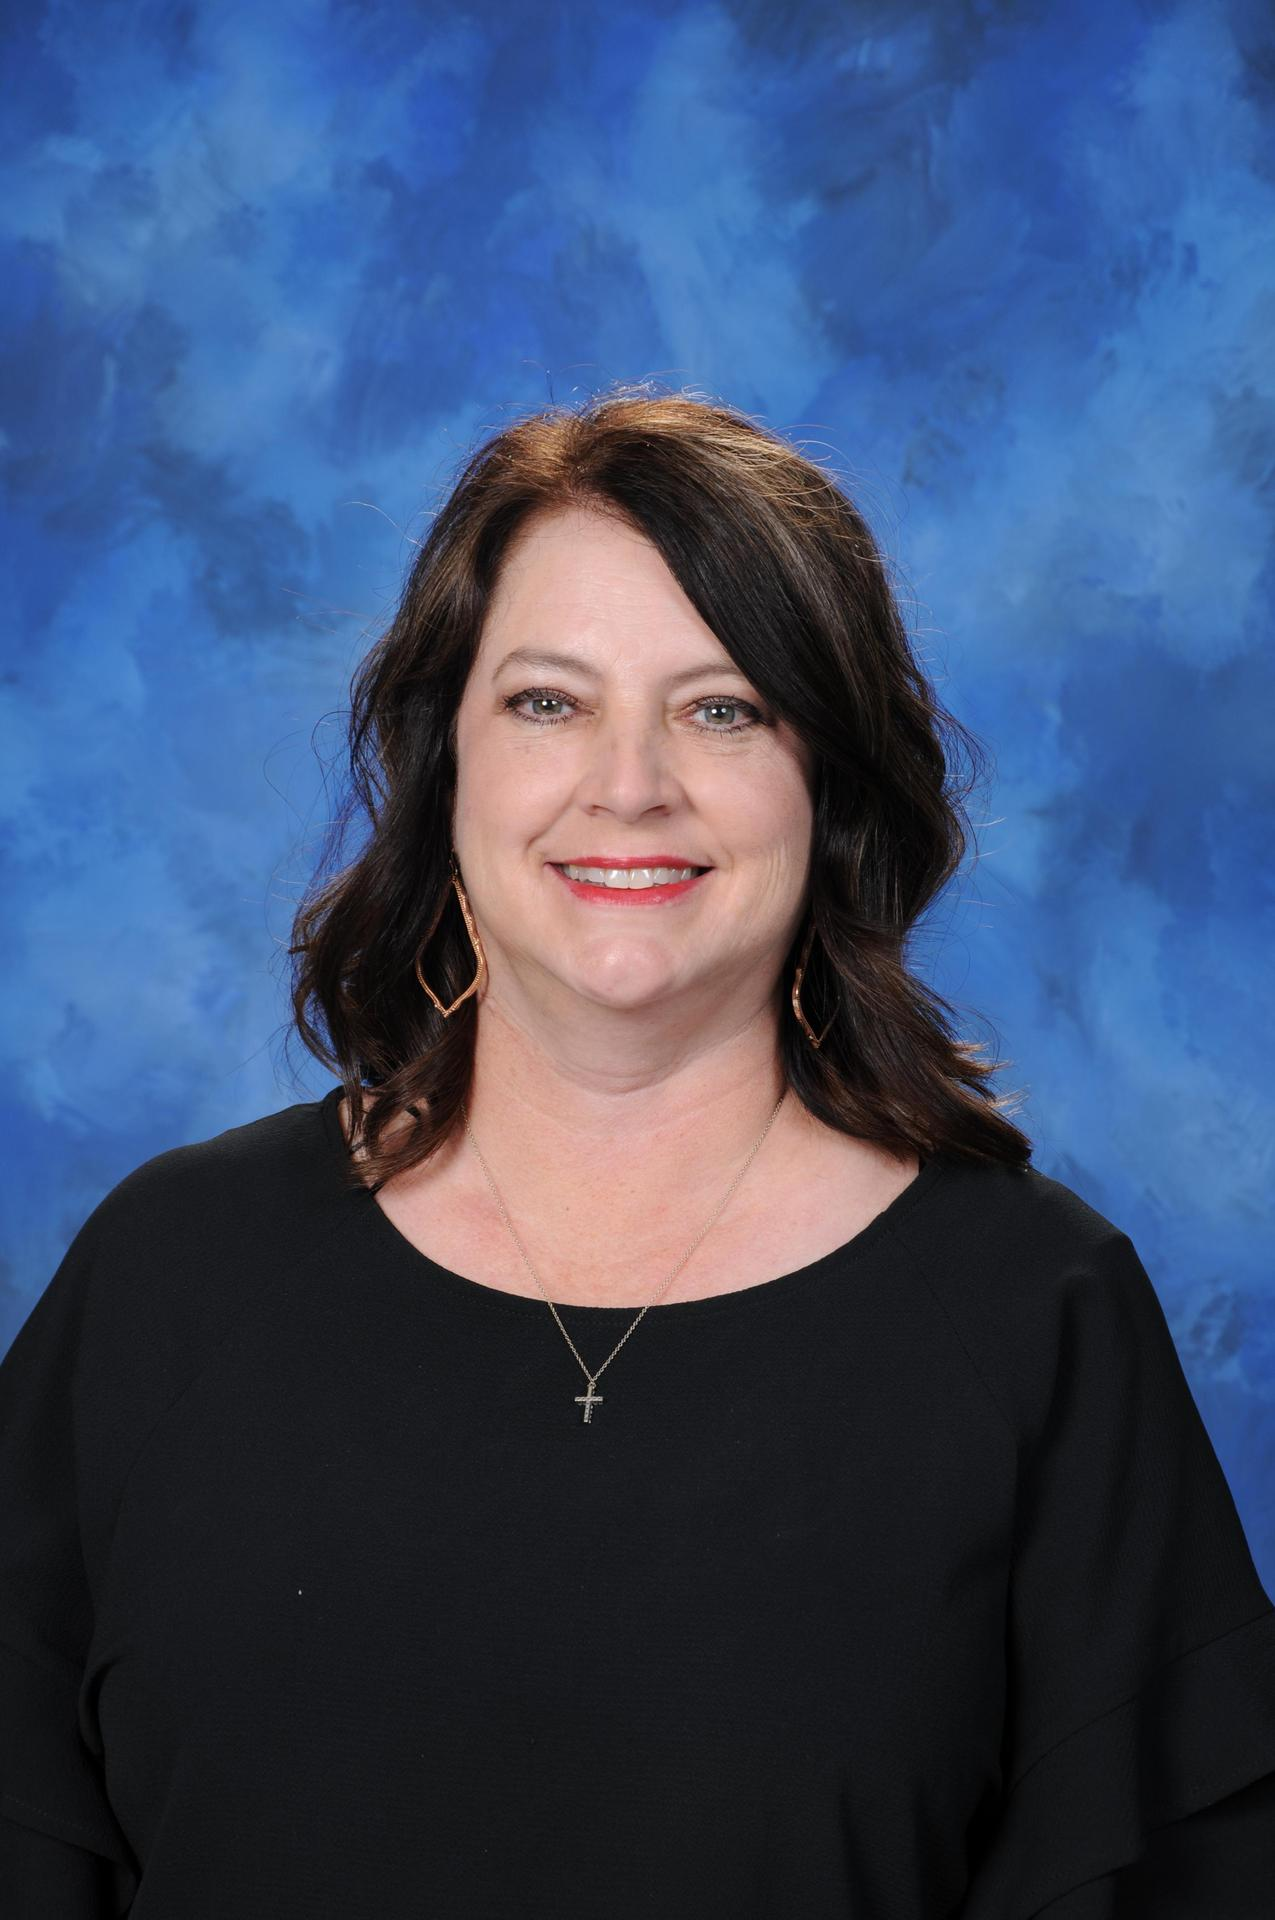 Principal Paige Wing